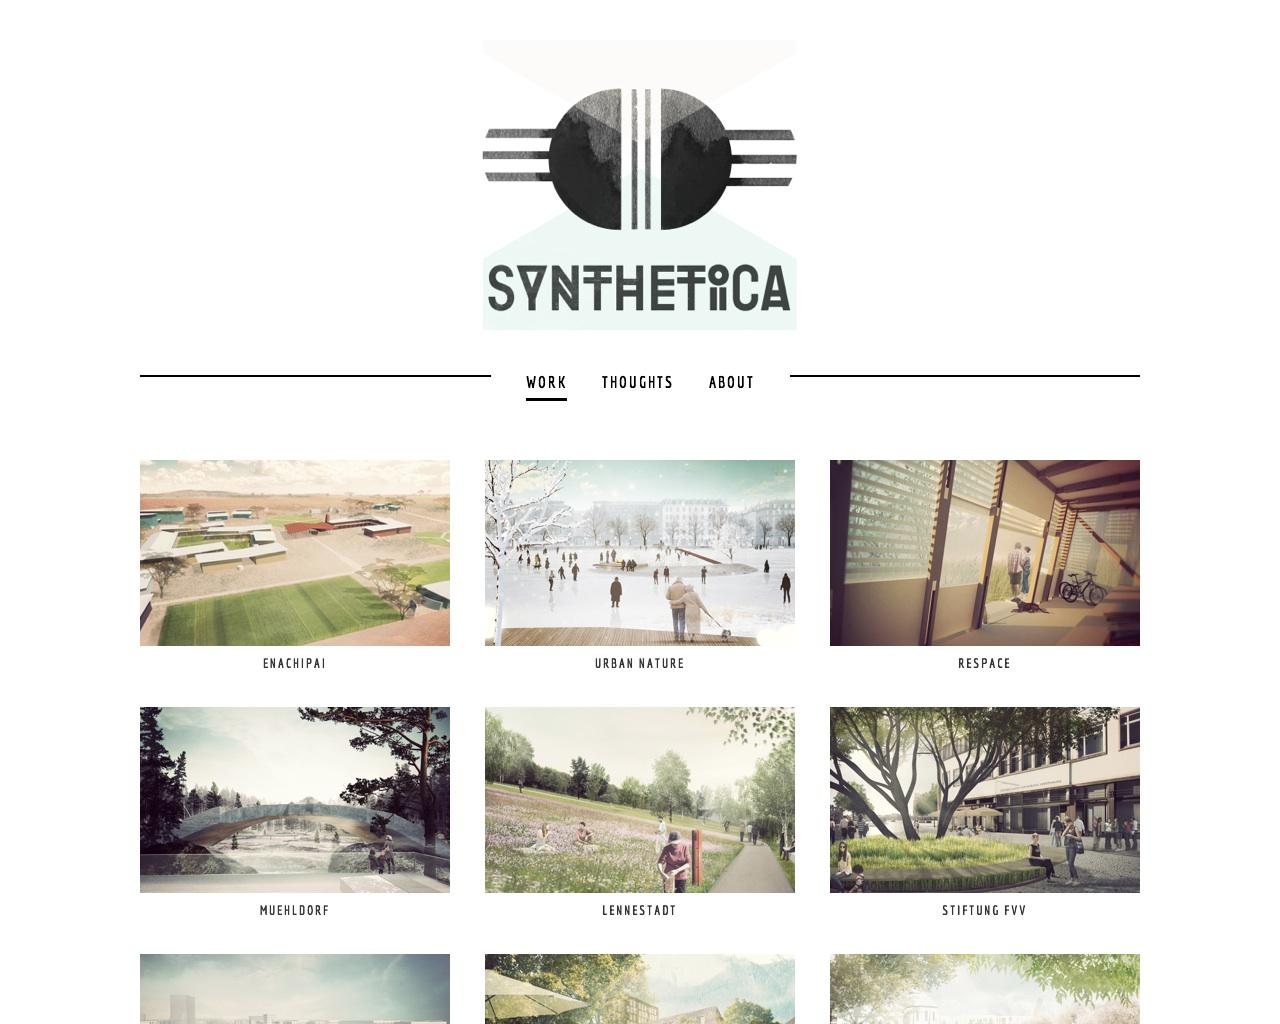 synthetica (20130821).jpg